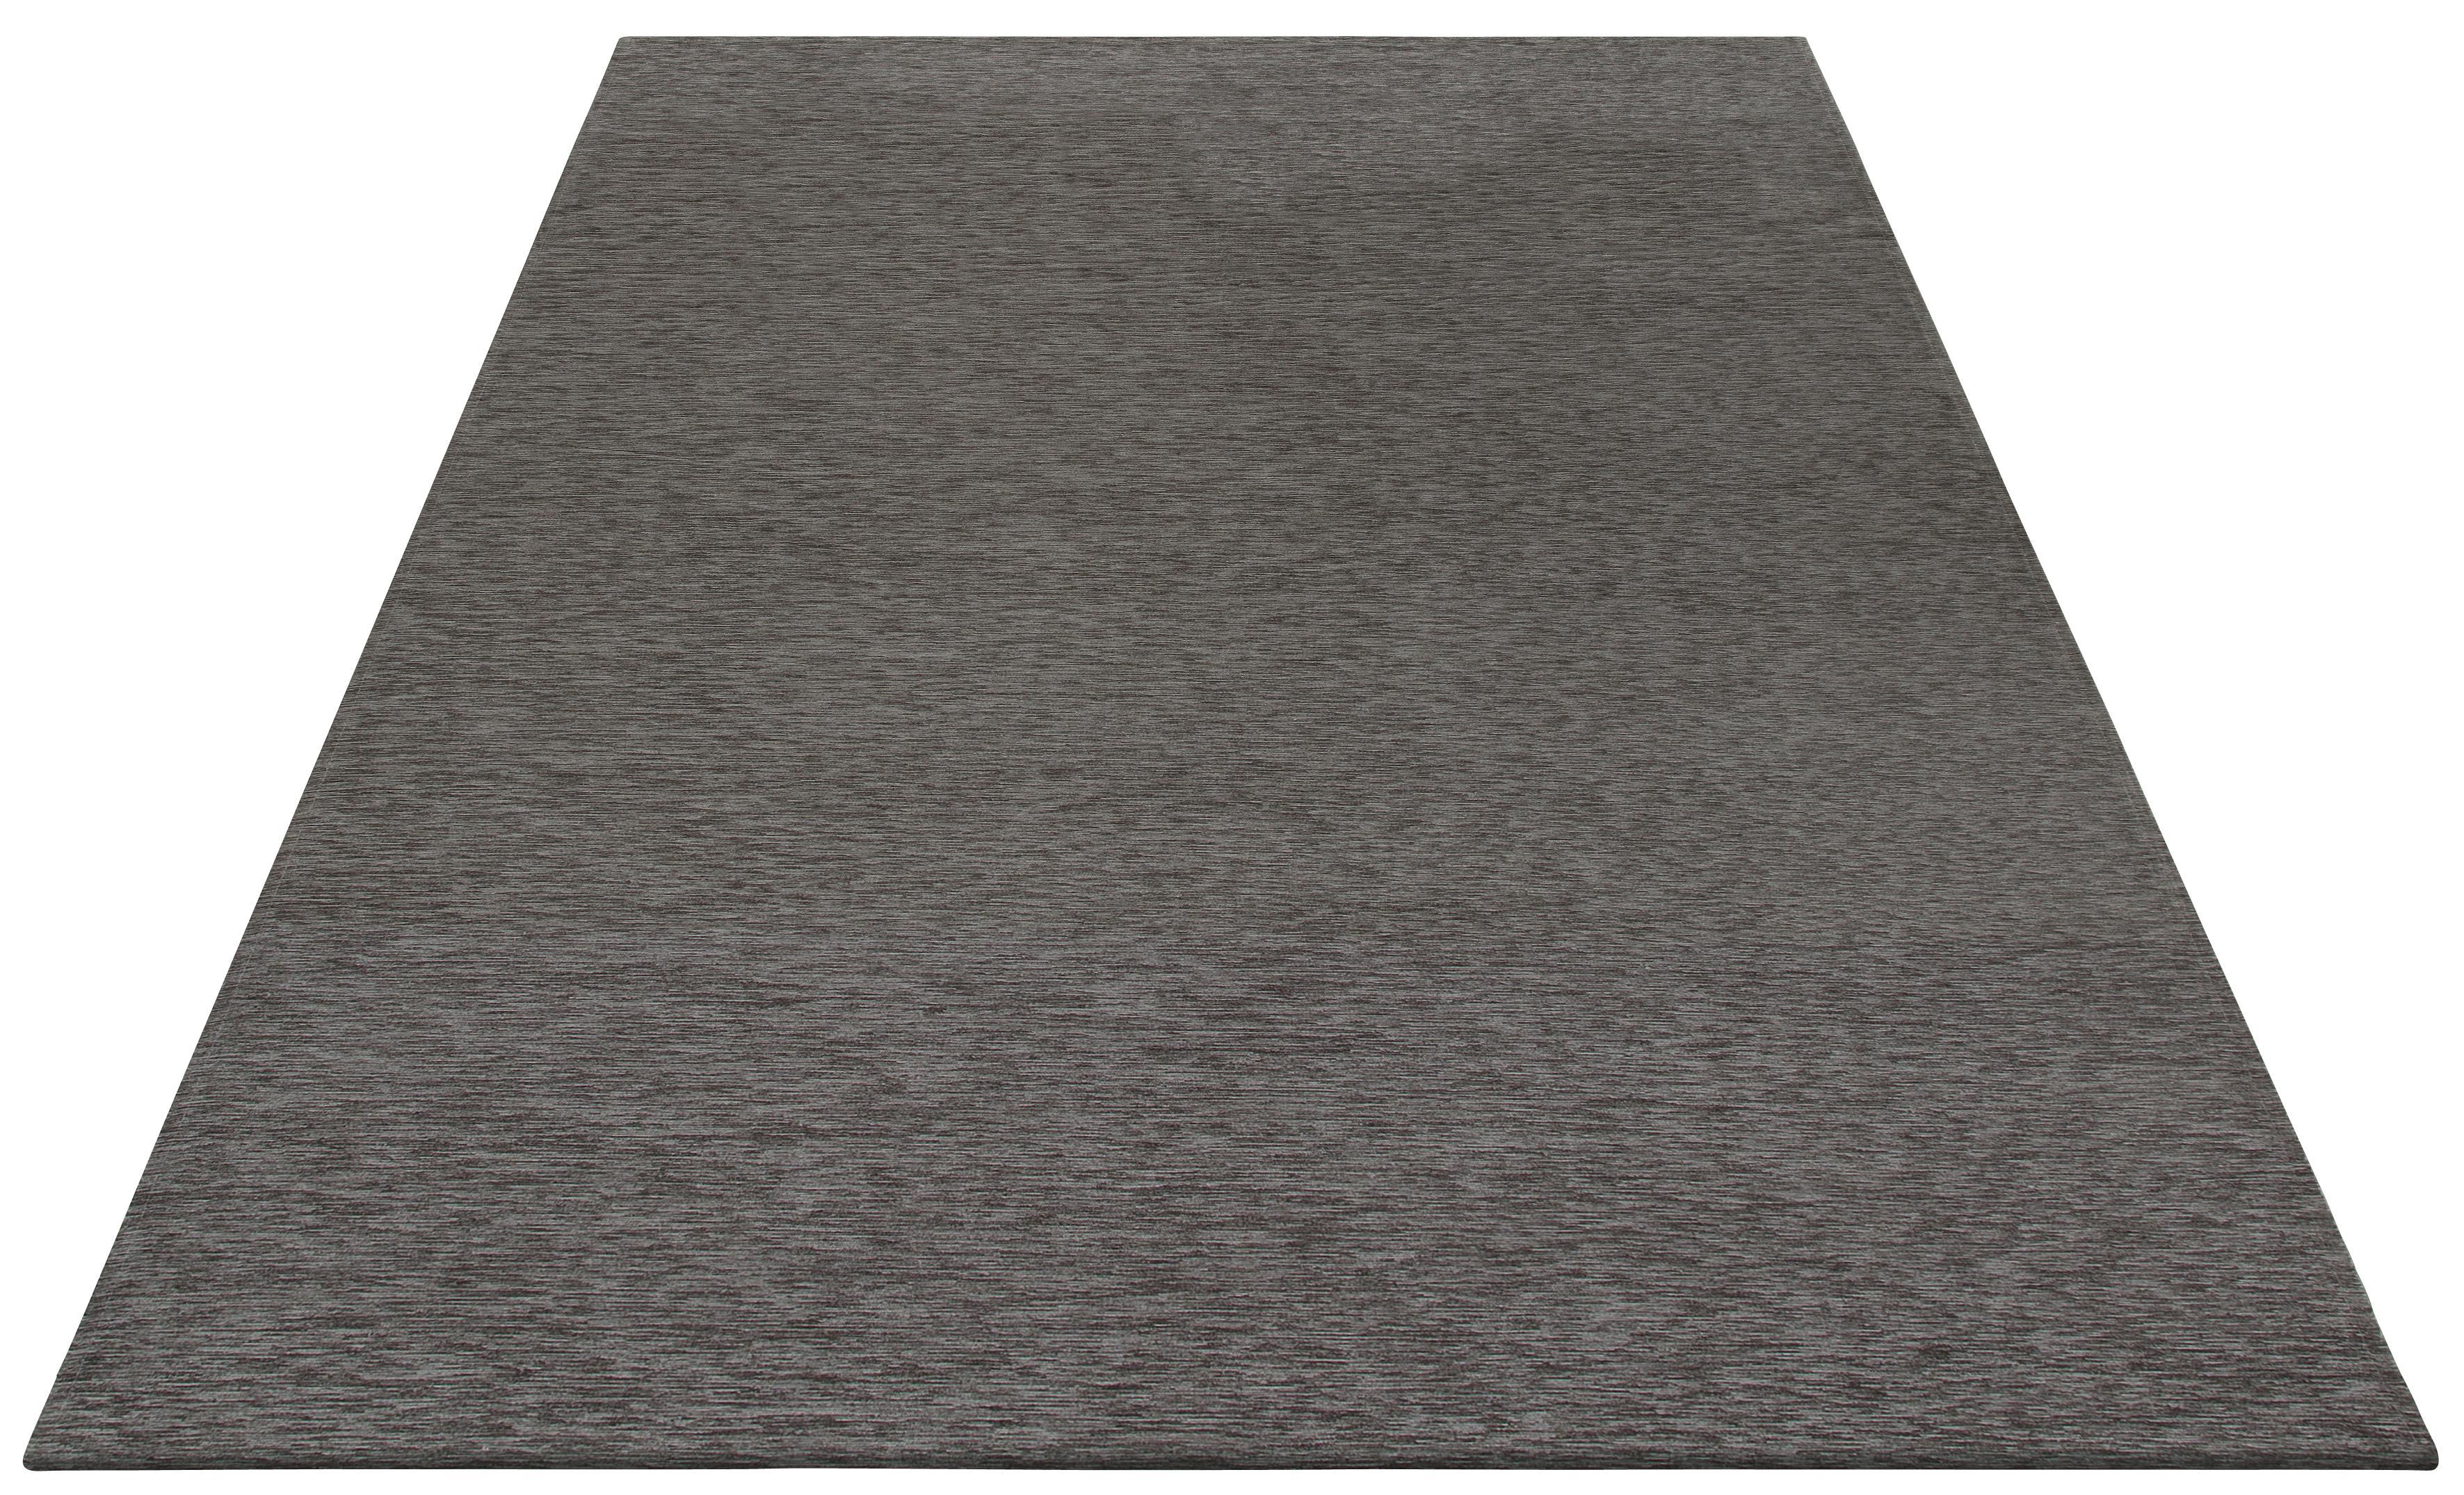 teppich piero my home rechteckig h he 2 mm. Black Bedroom Furniture Sets. Home Design Ideas